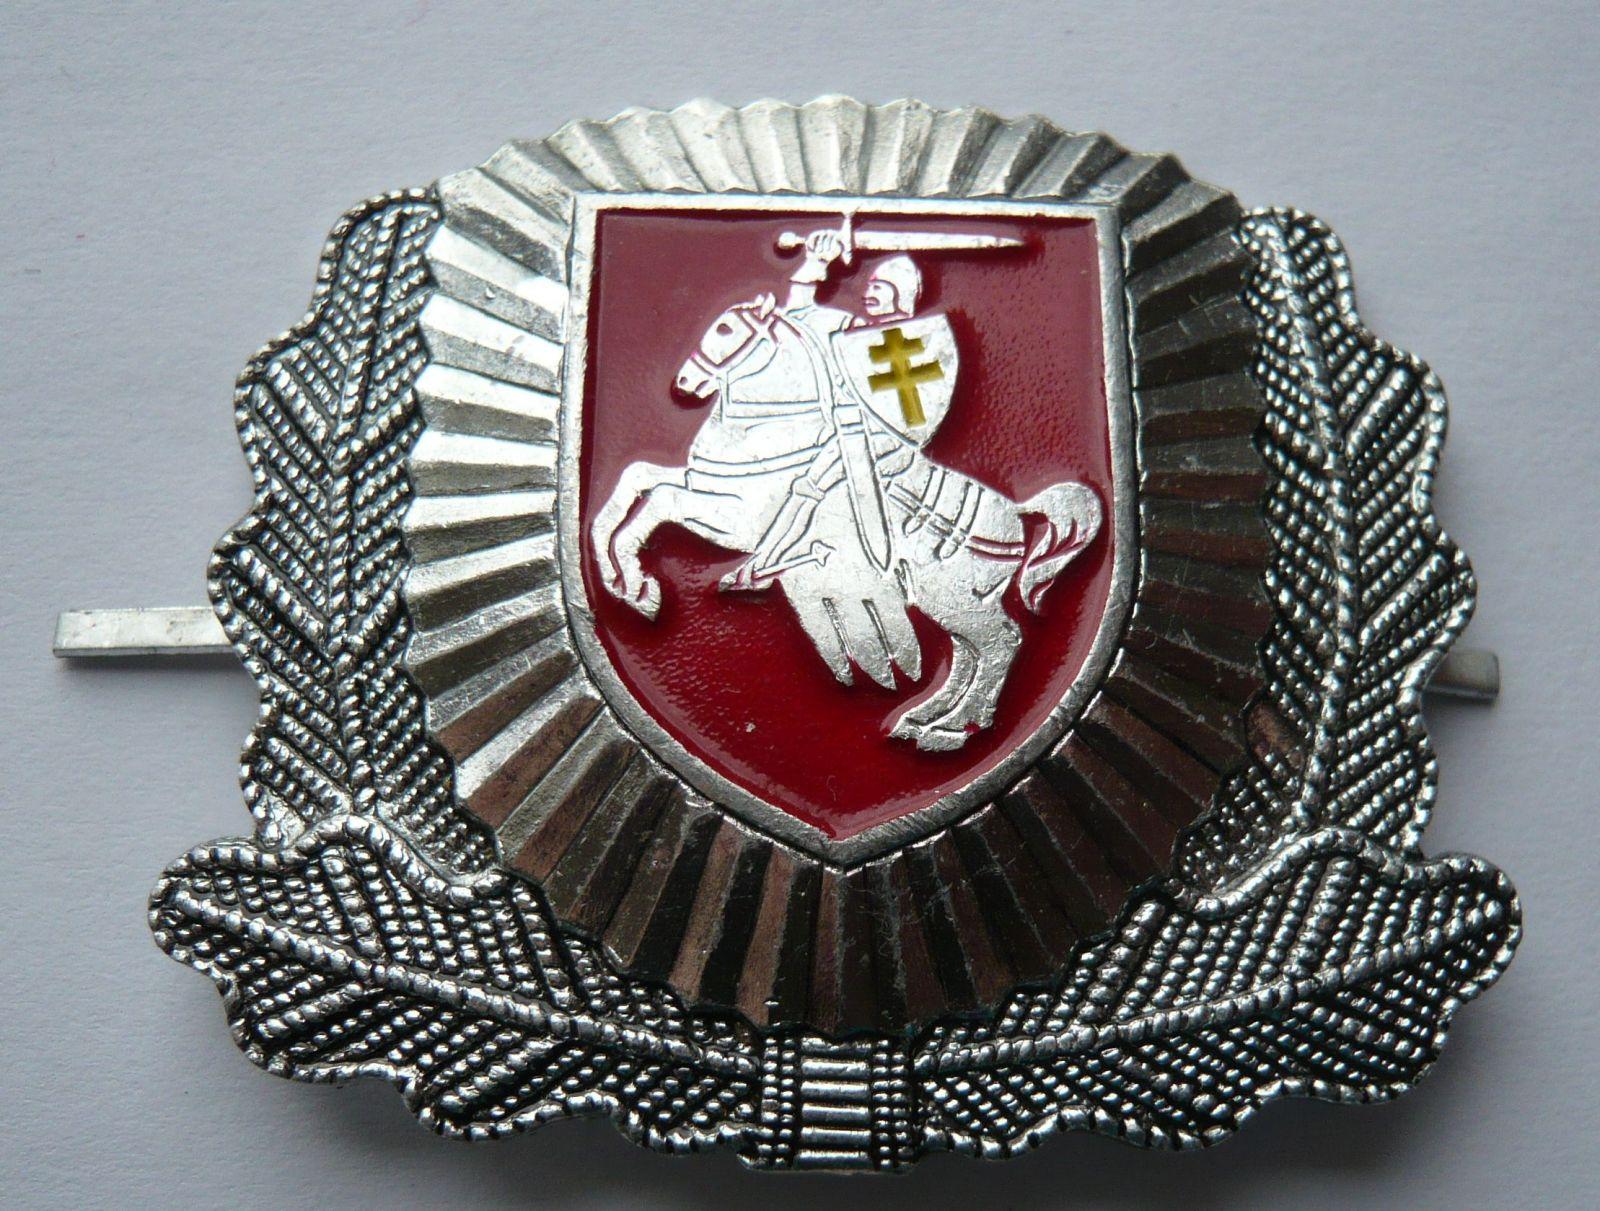 Litva odznak důstojníka